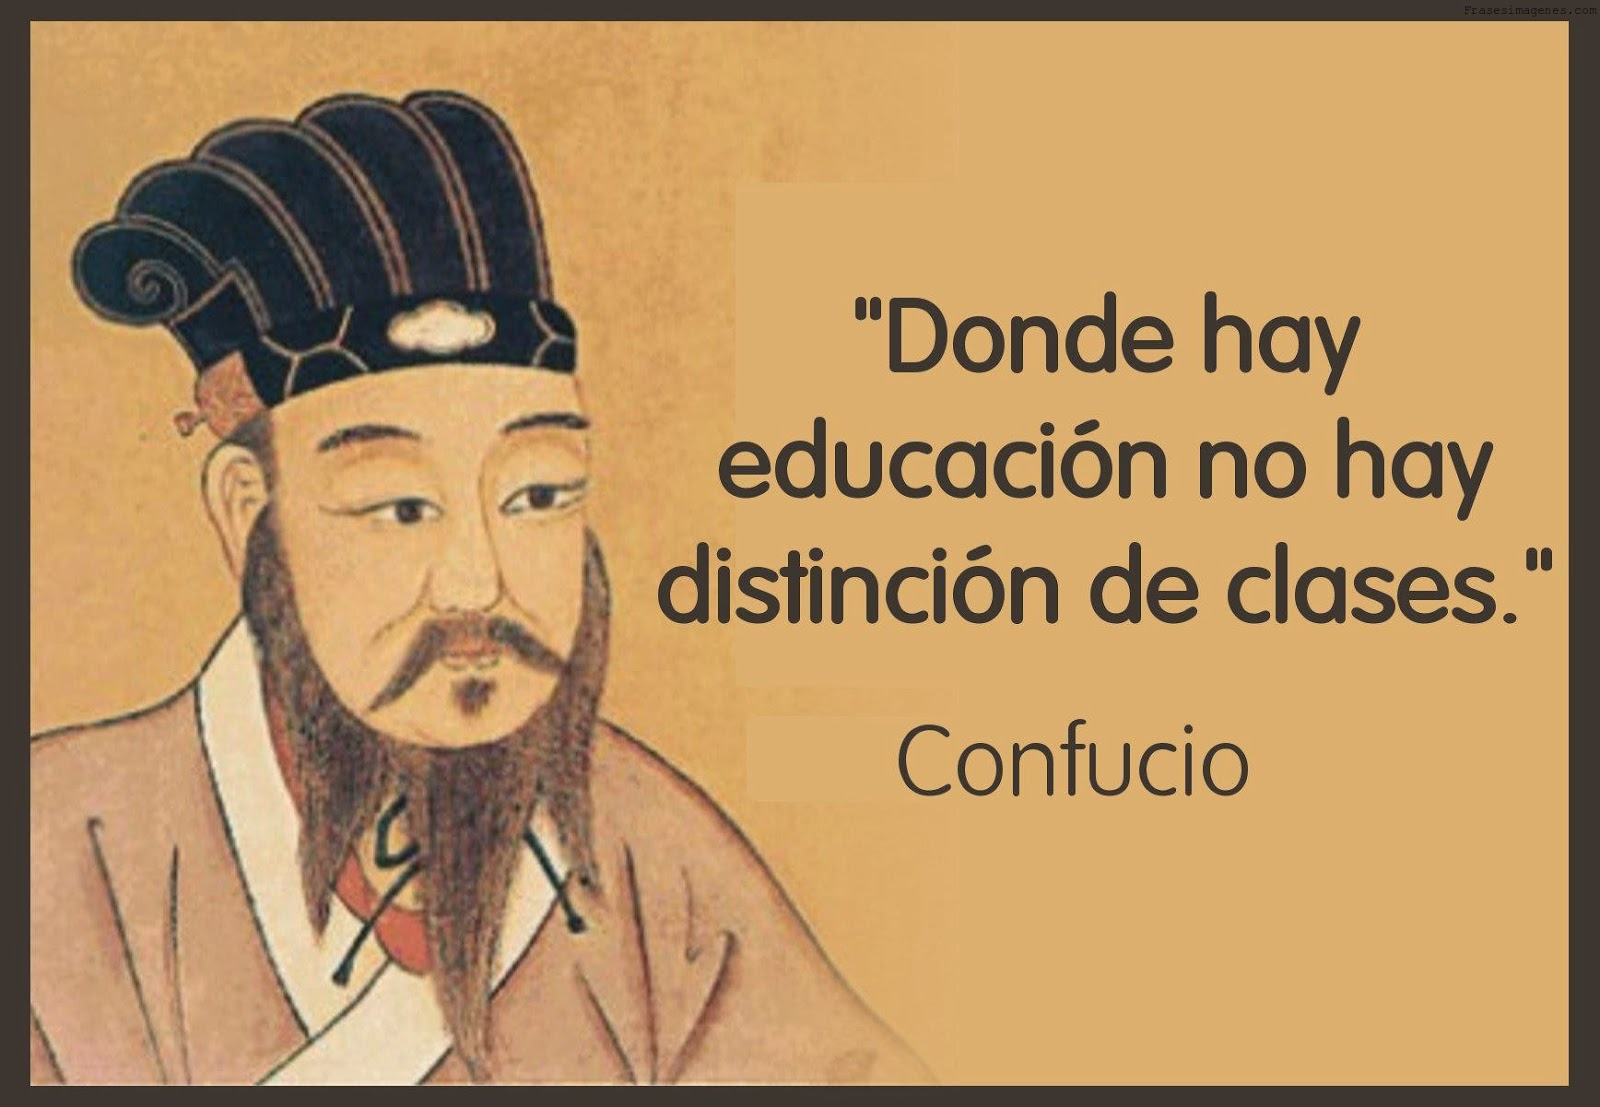 Se sabe que donde llega a haber educación